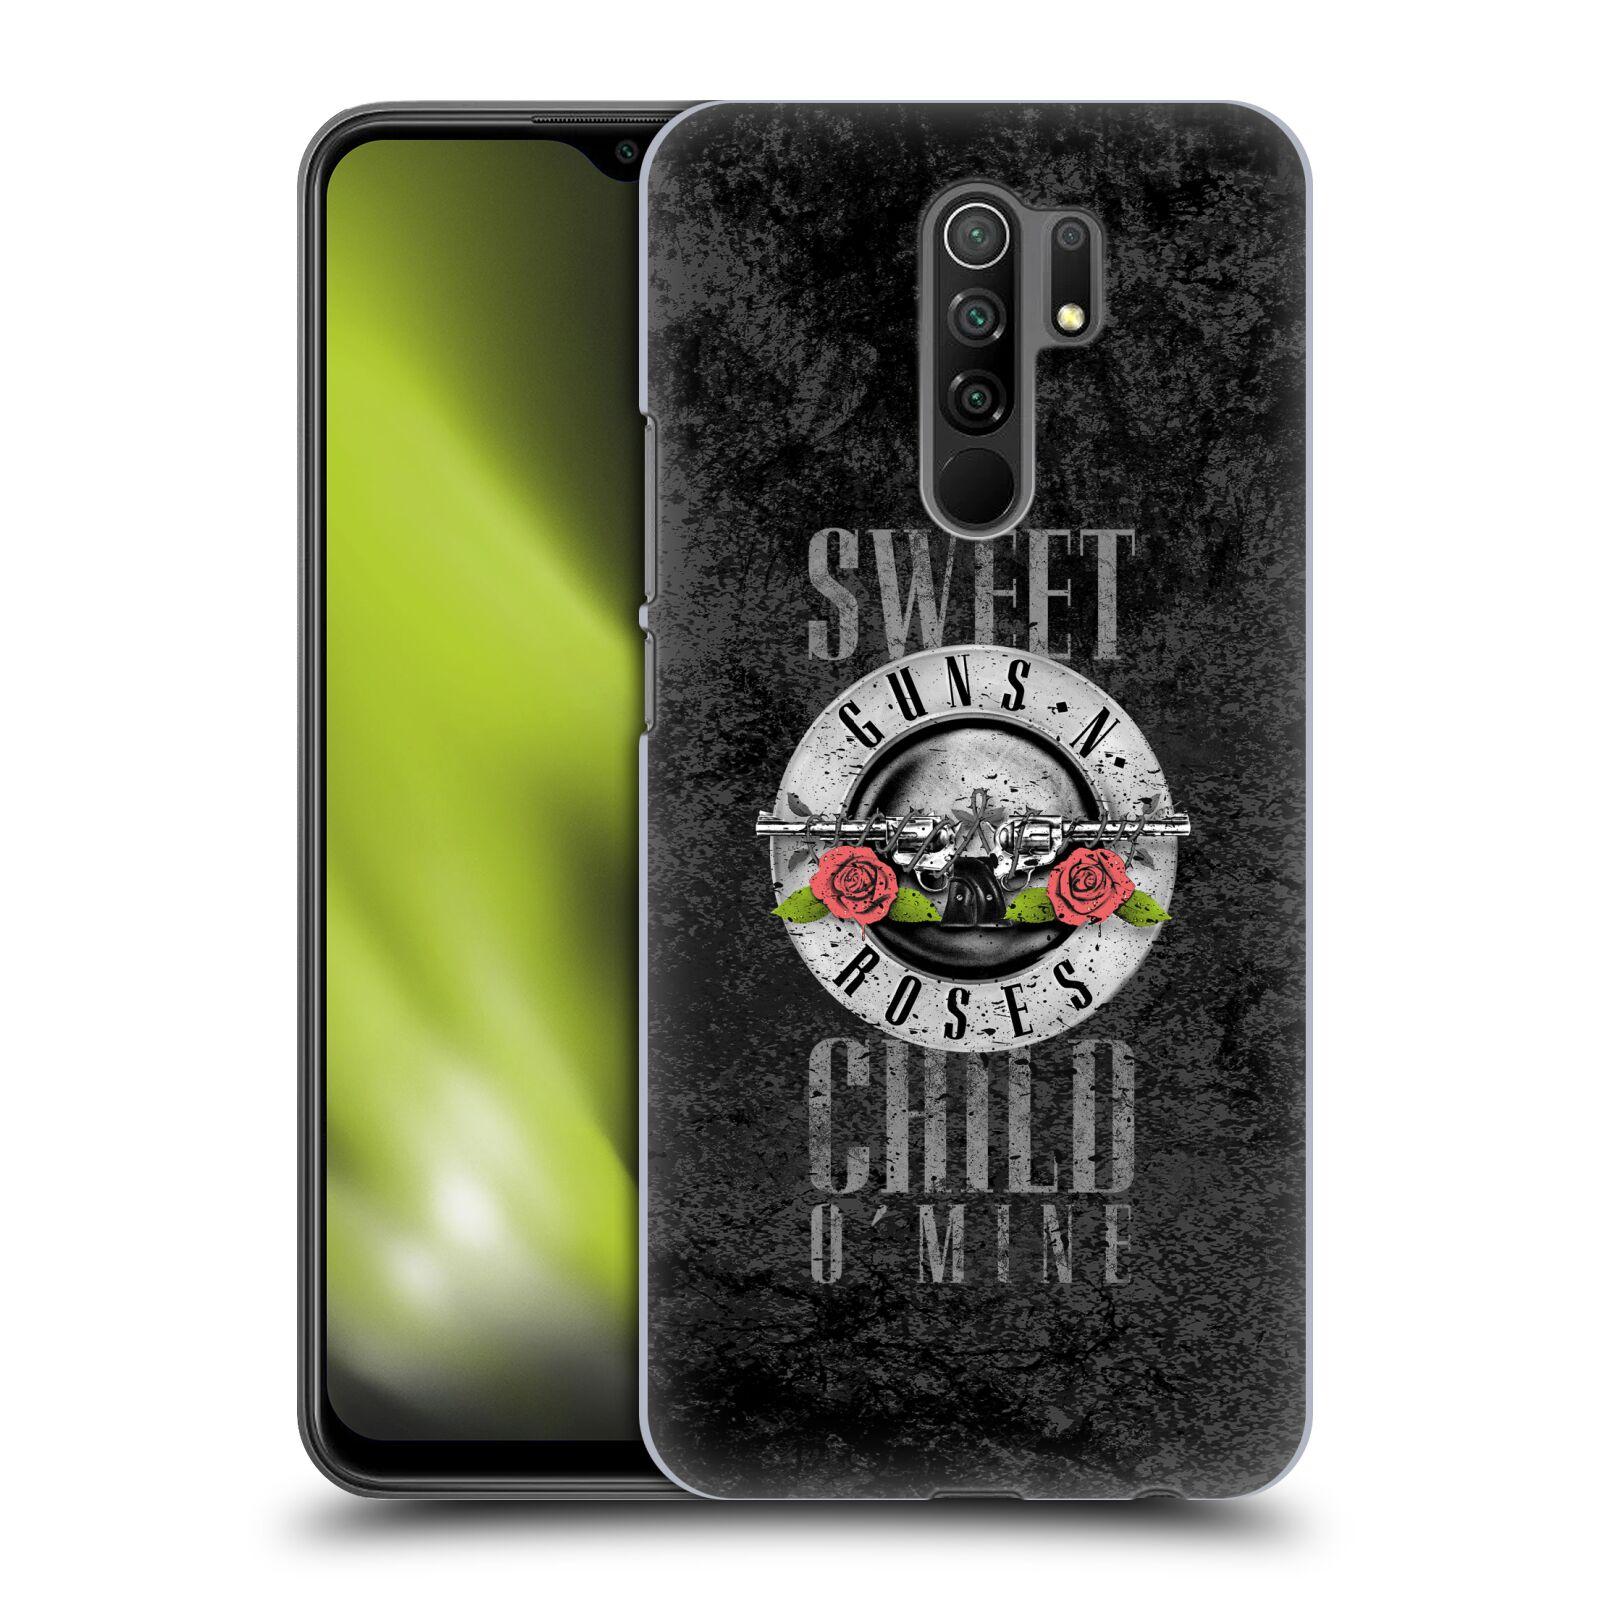 Plastové pouzdro na mobil Xiaomi Redmi 9 - Head Case - Guns N' Roses - Sweet Child